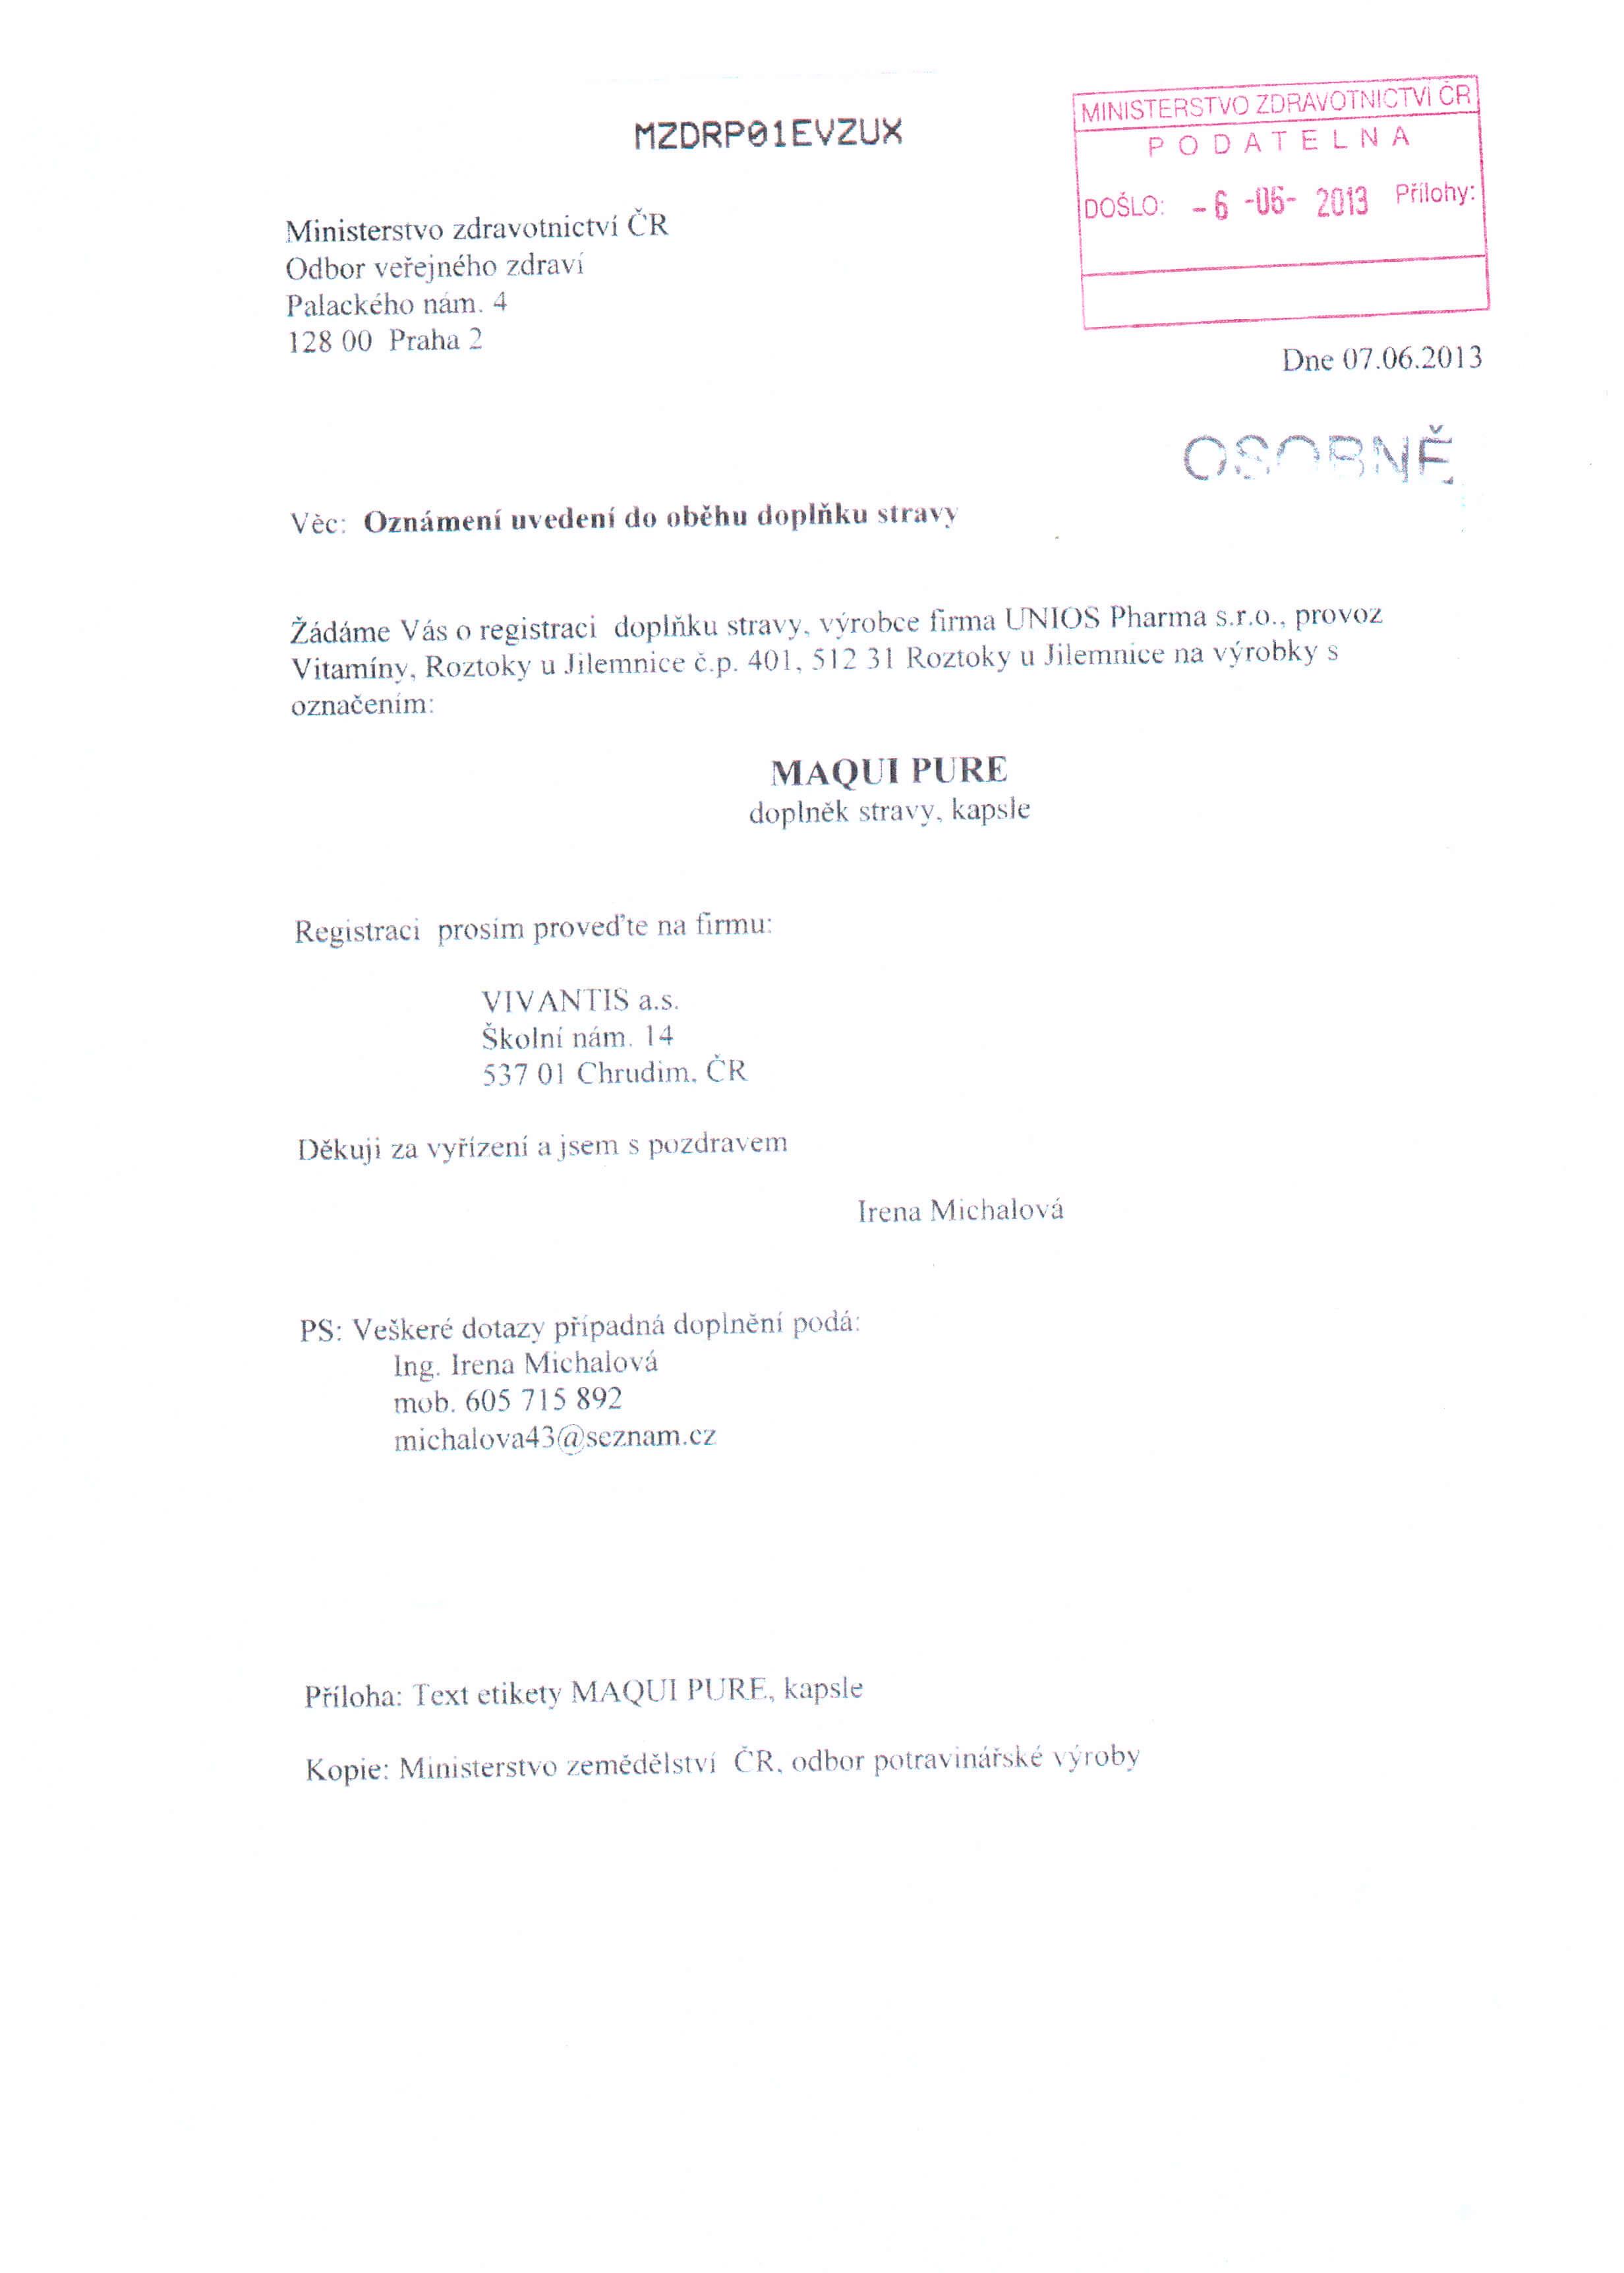 Certifikát Maqui 2013-2